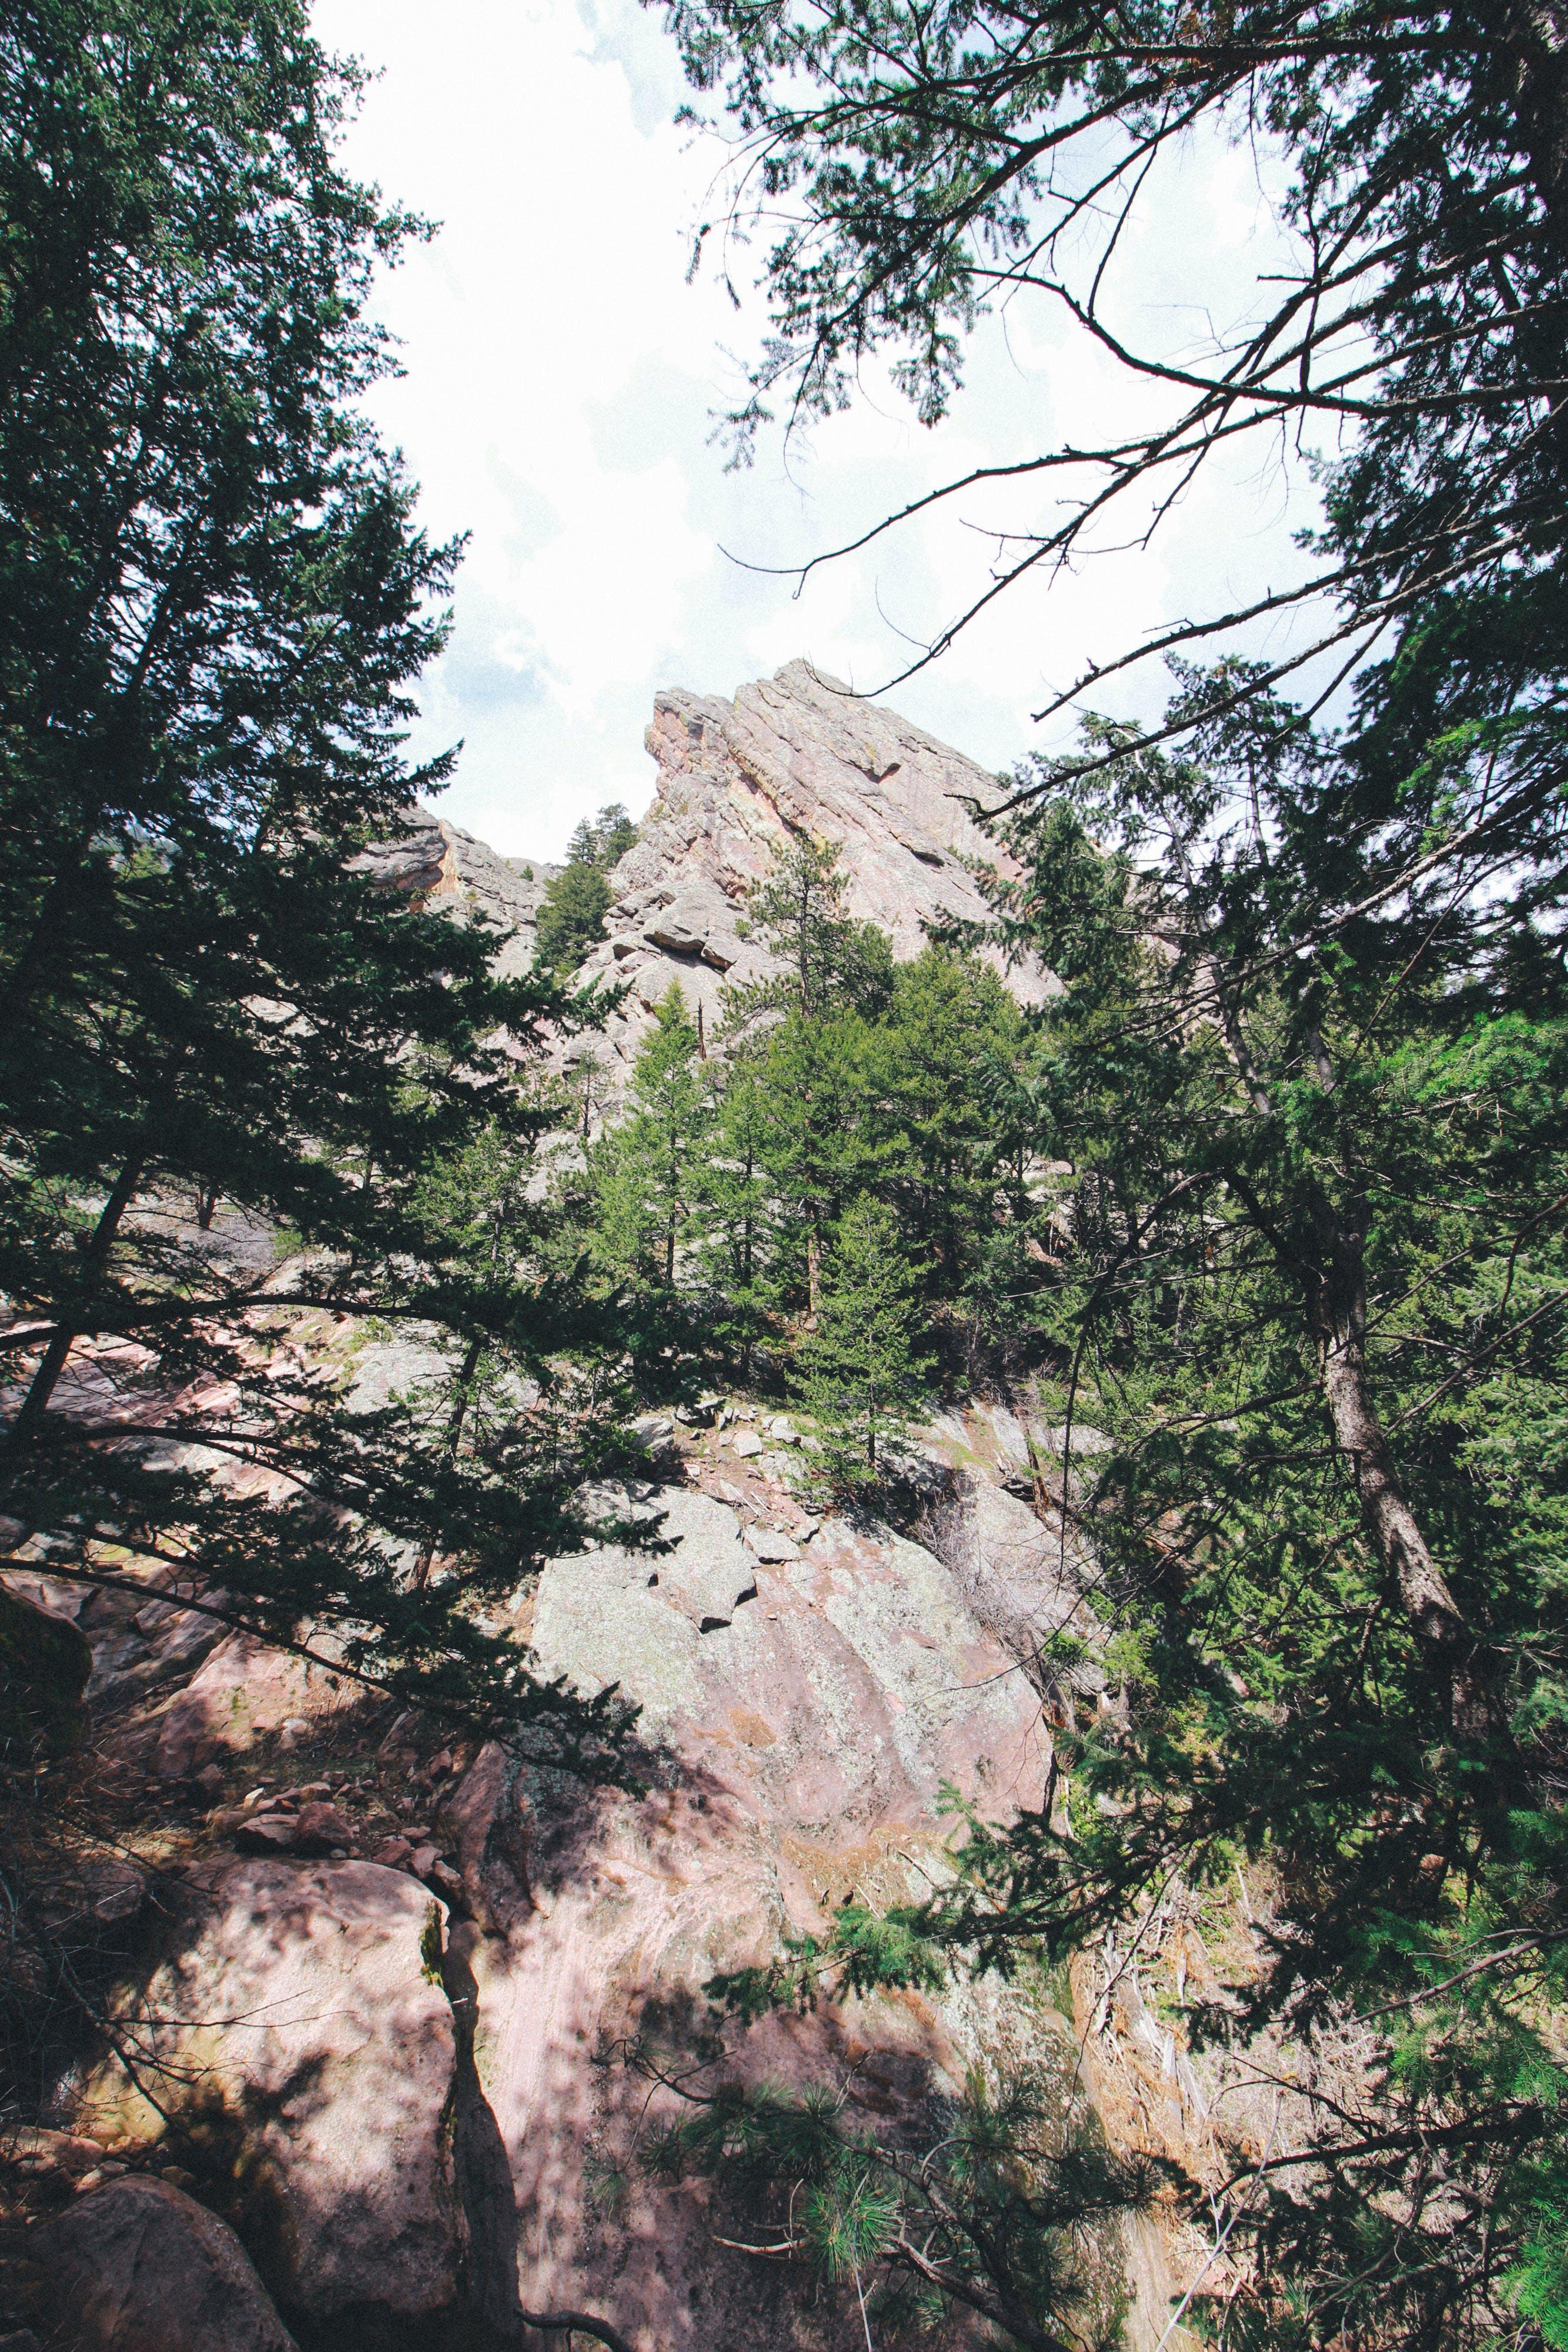 Free stock photo of big rocks, climbing, forest, hiking